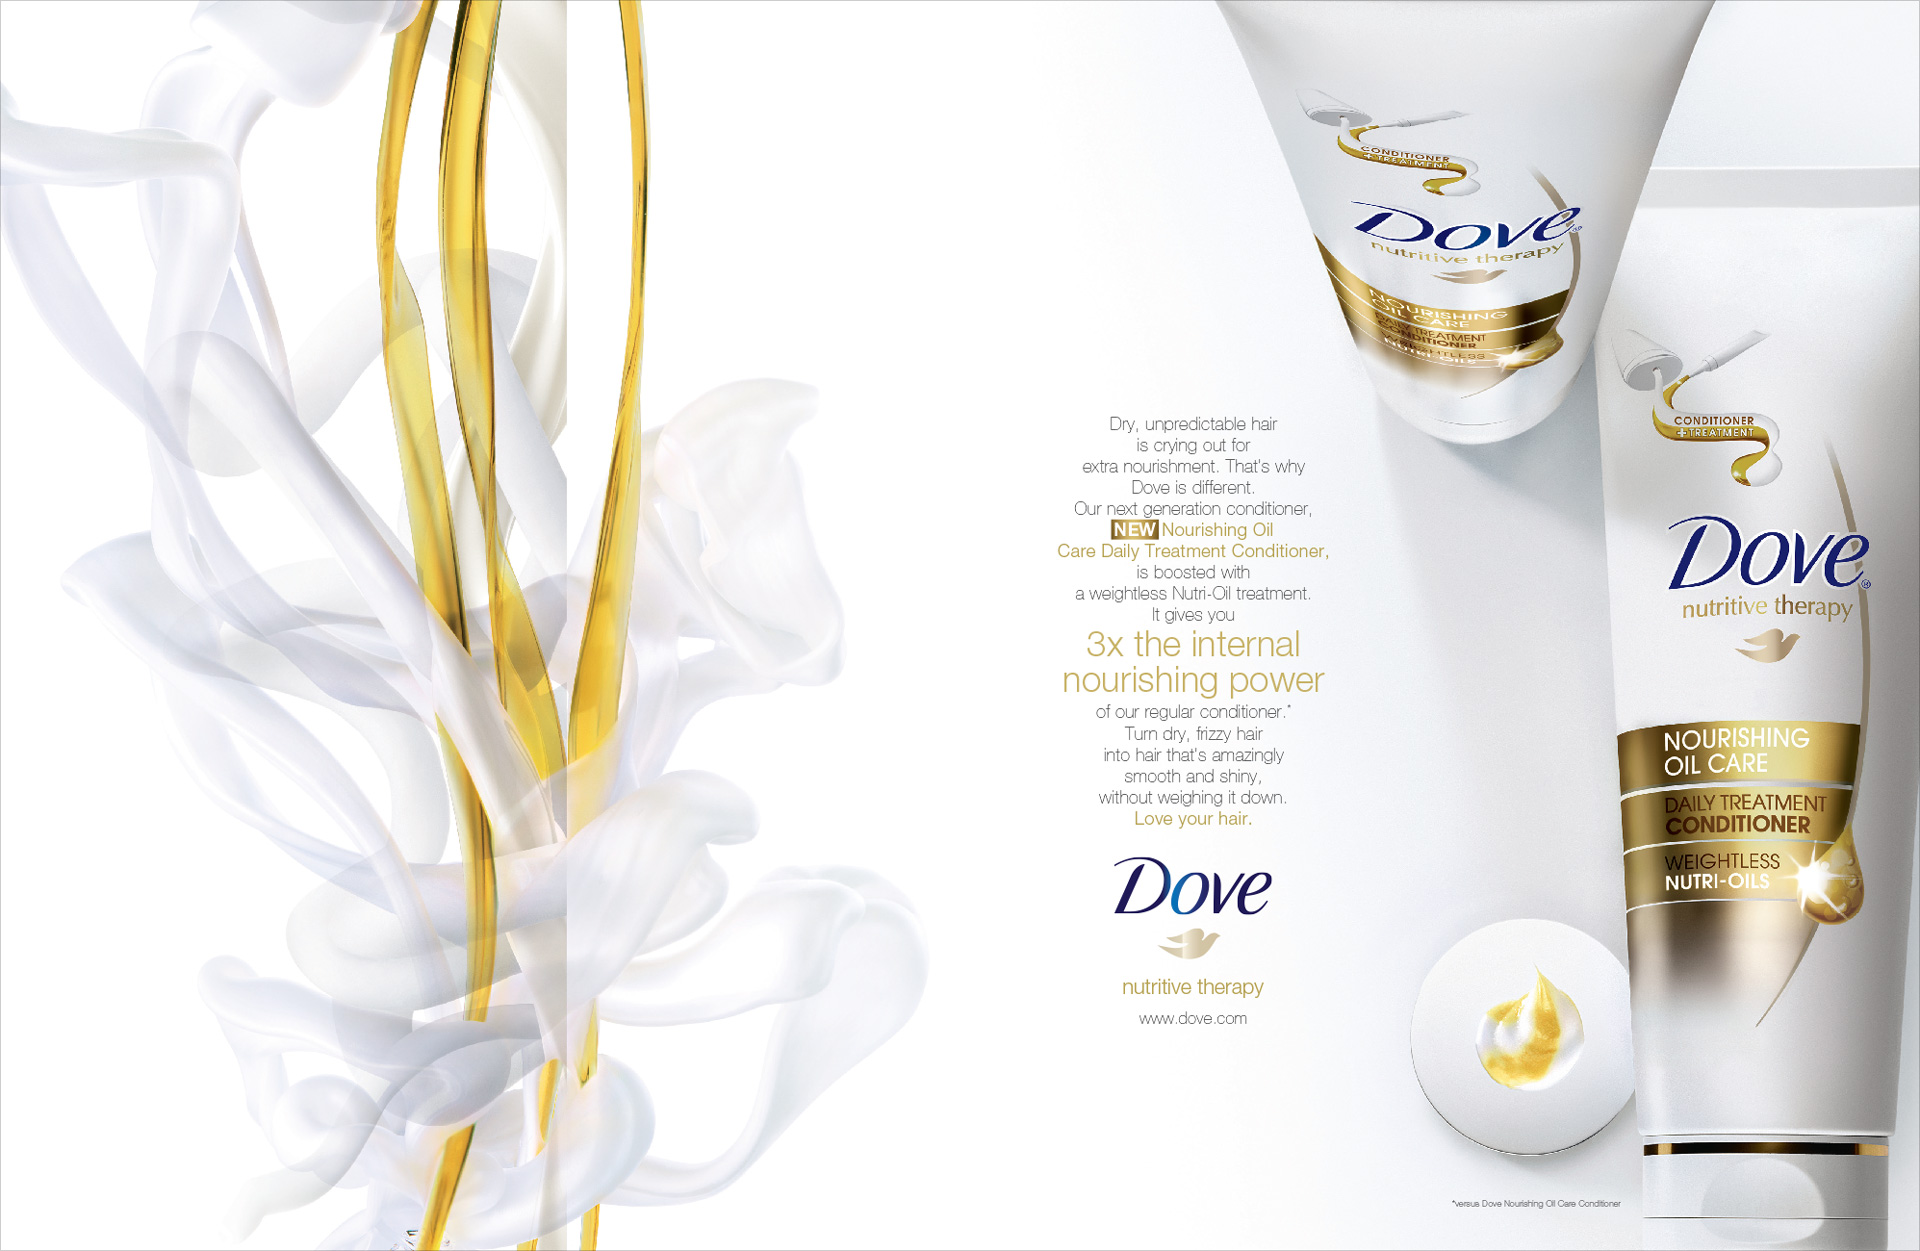 Dove03.jpg